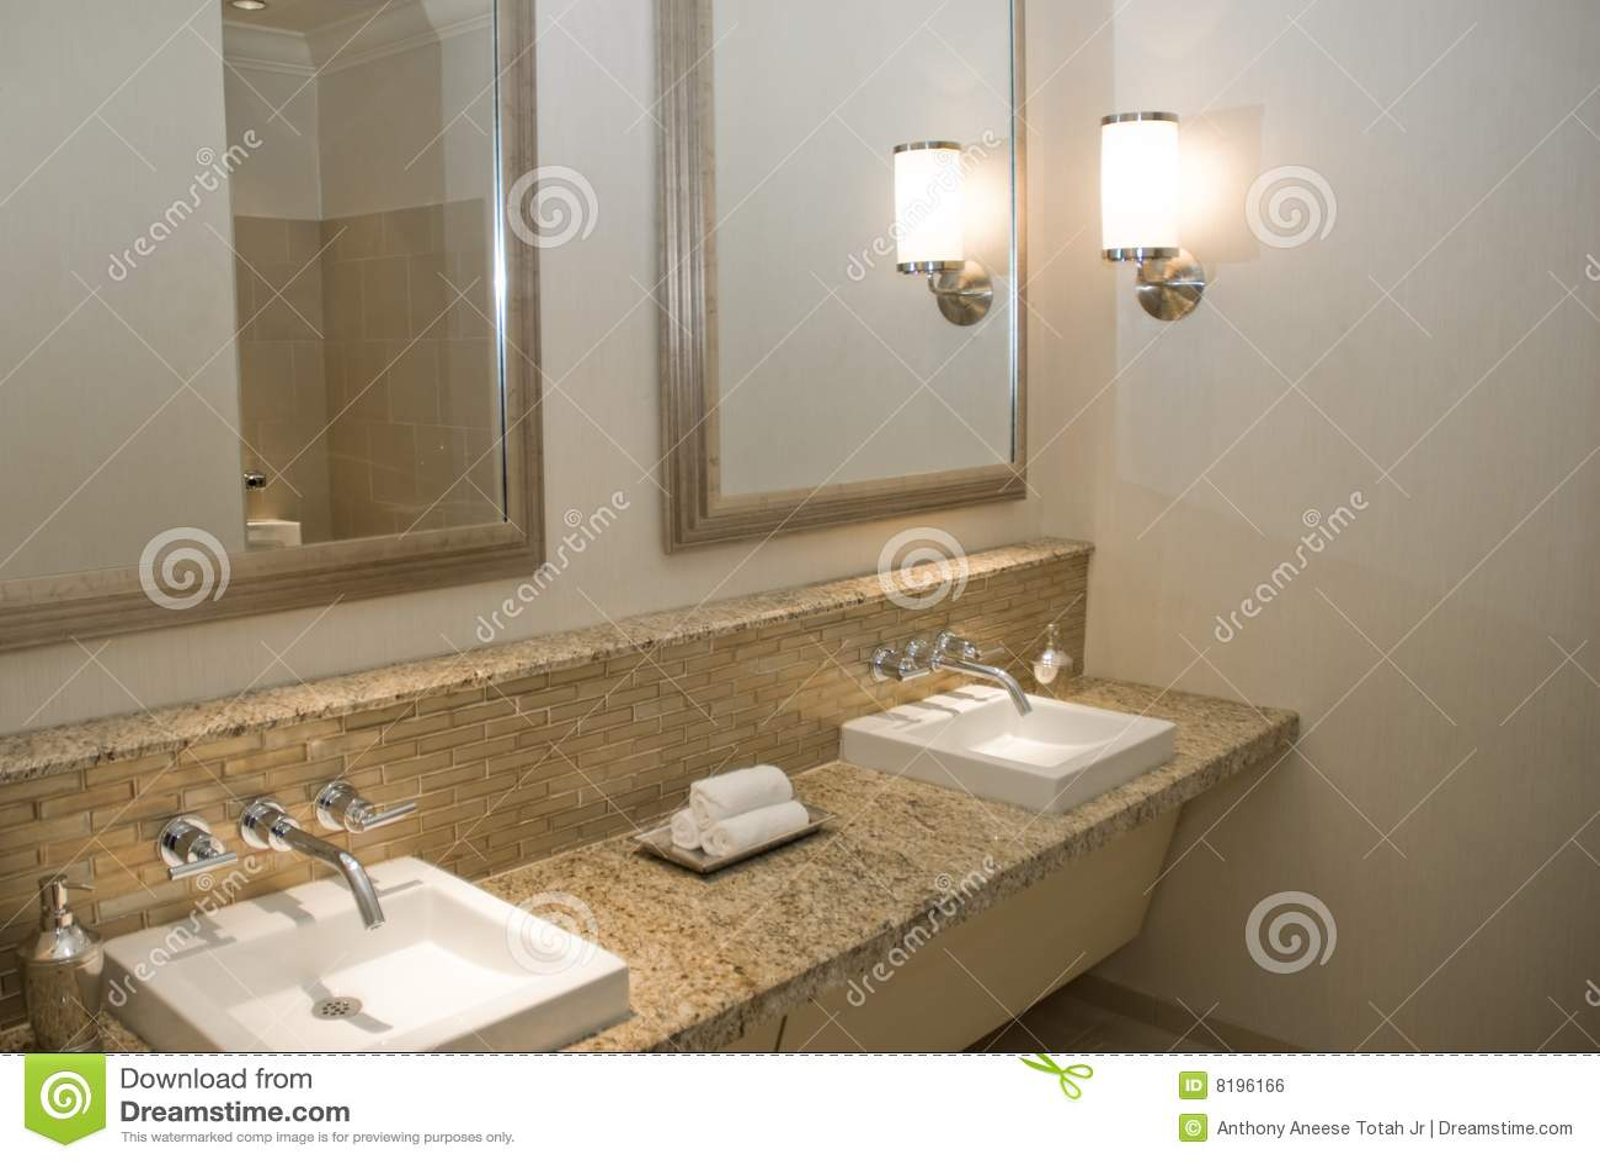 Vaidade de gama alta do banheiro